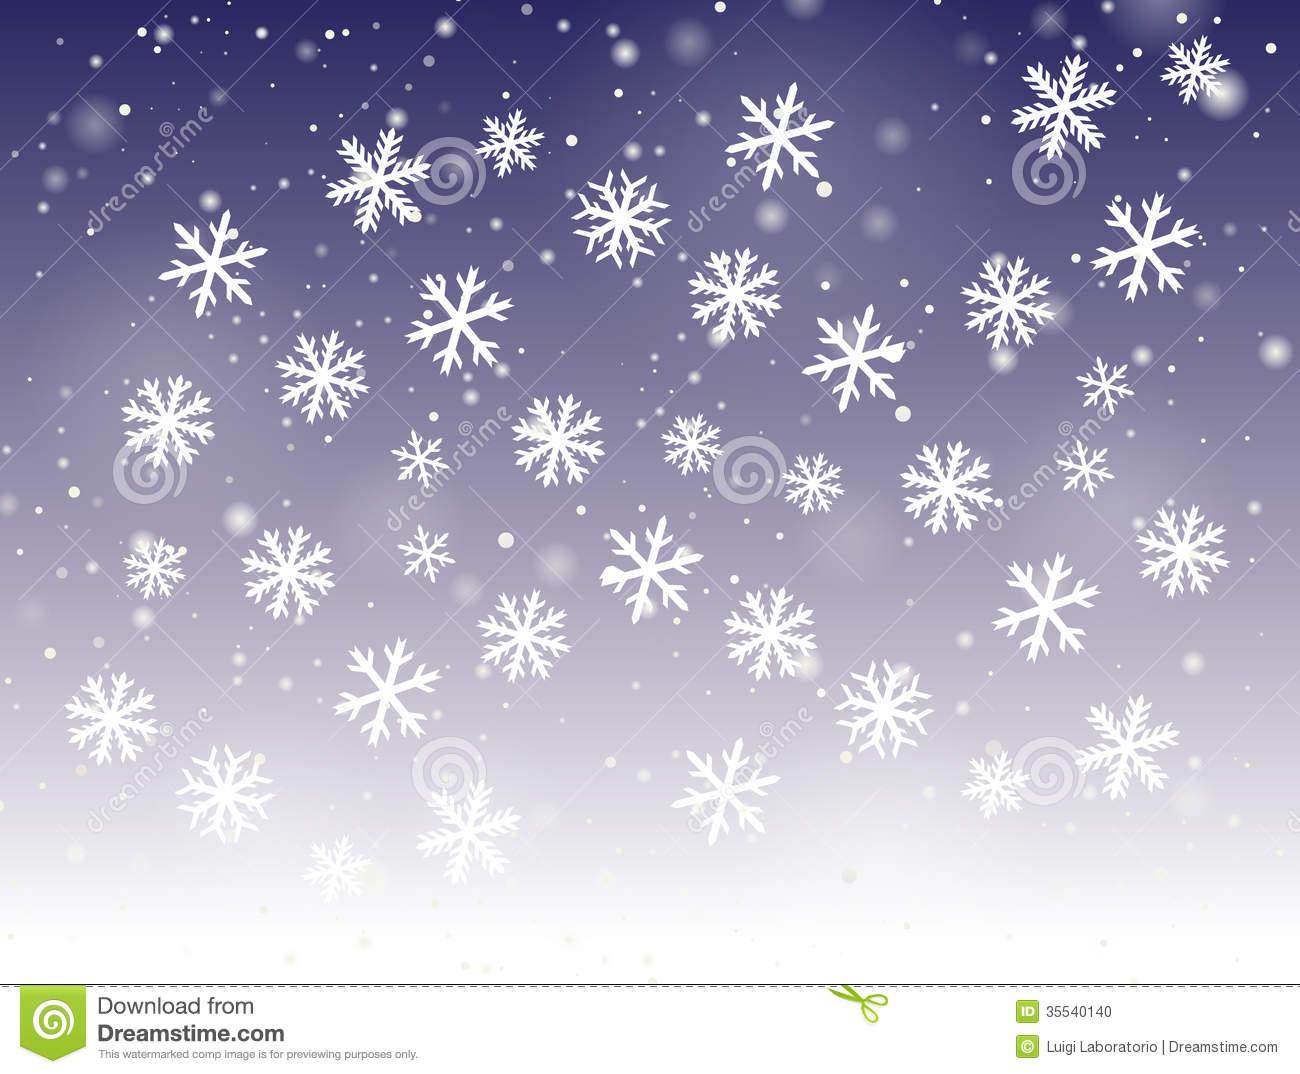 Snowfall clipart #9, Download drawings